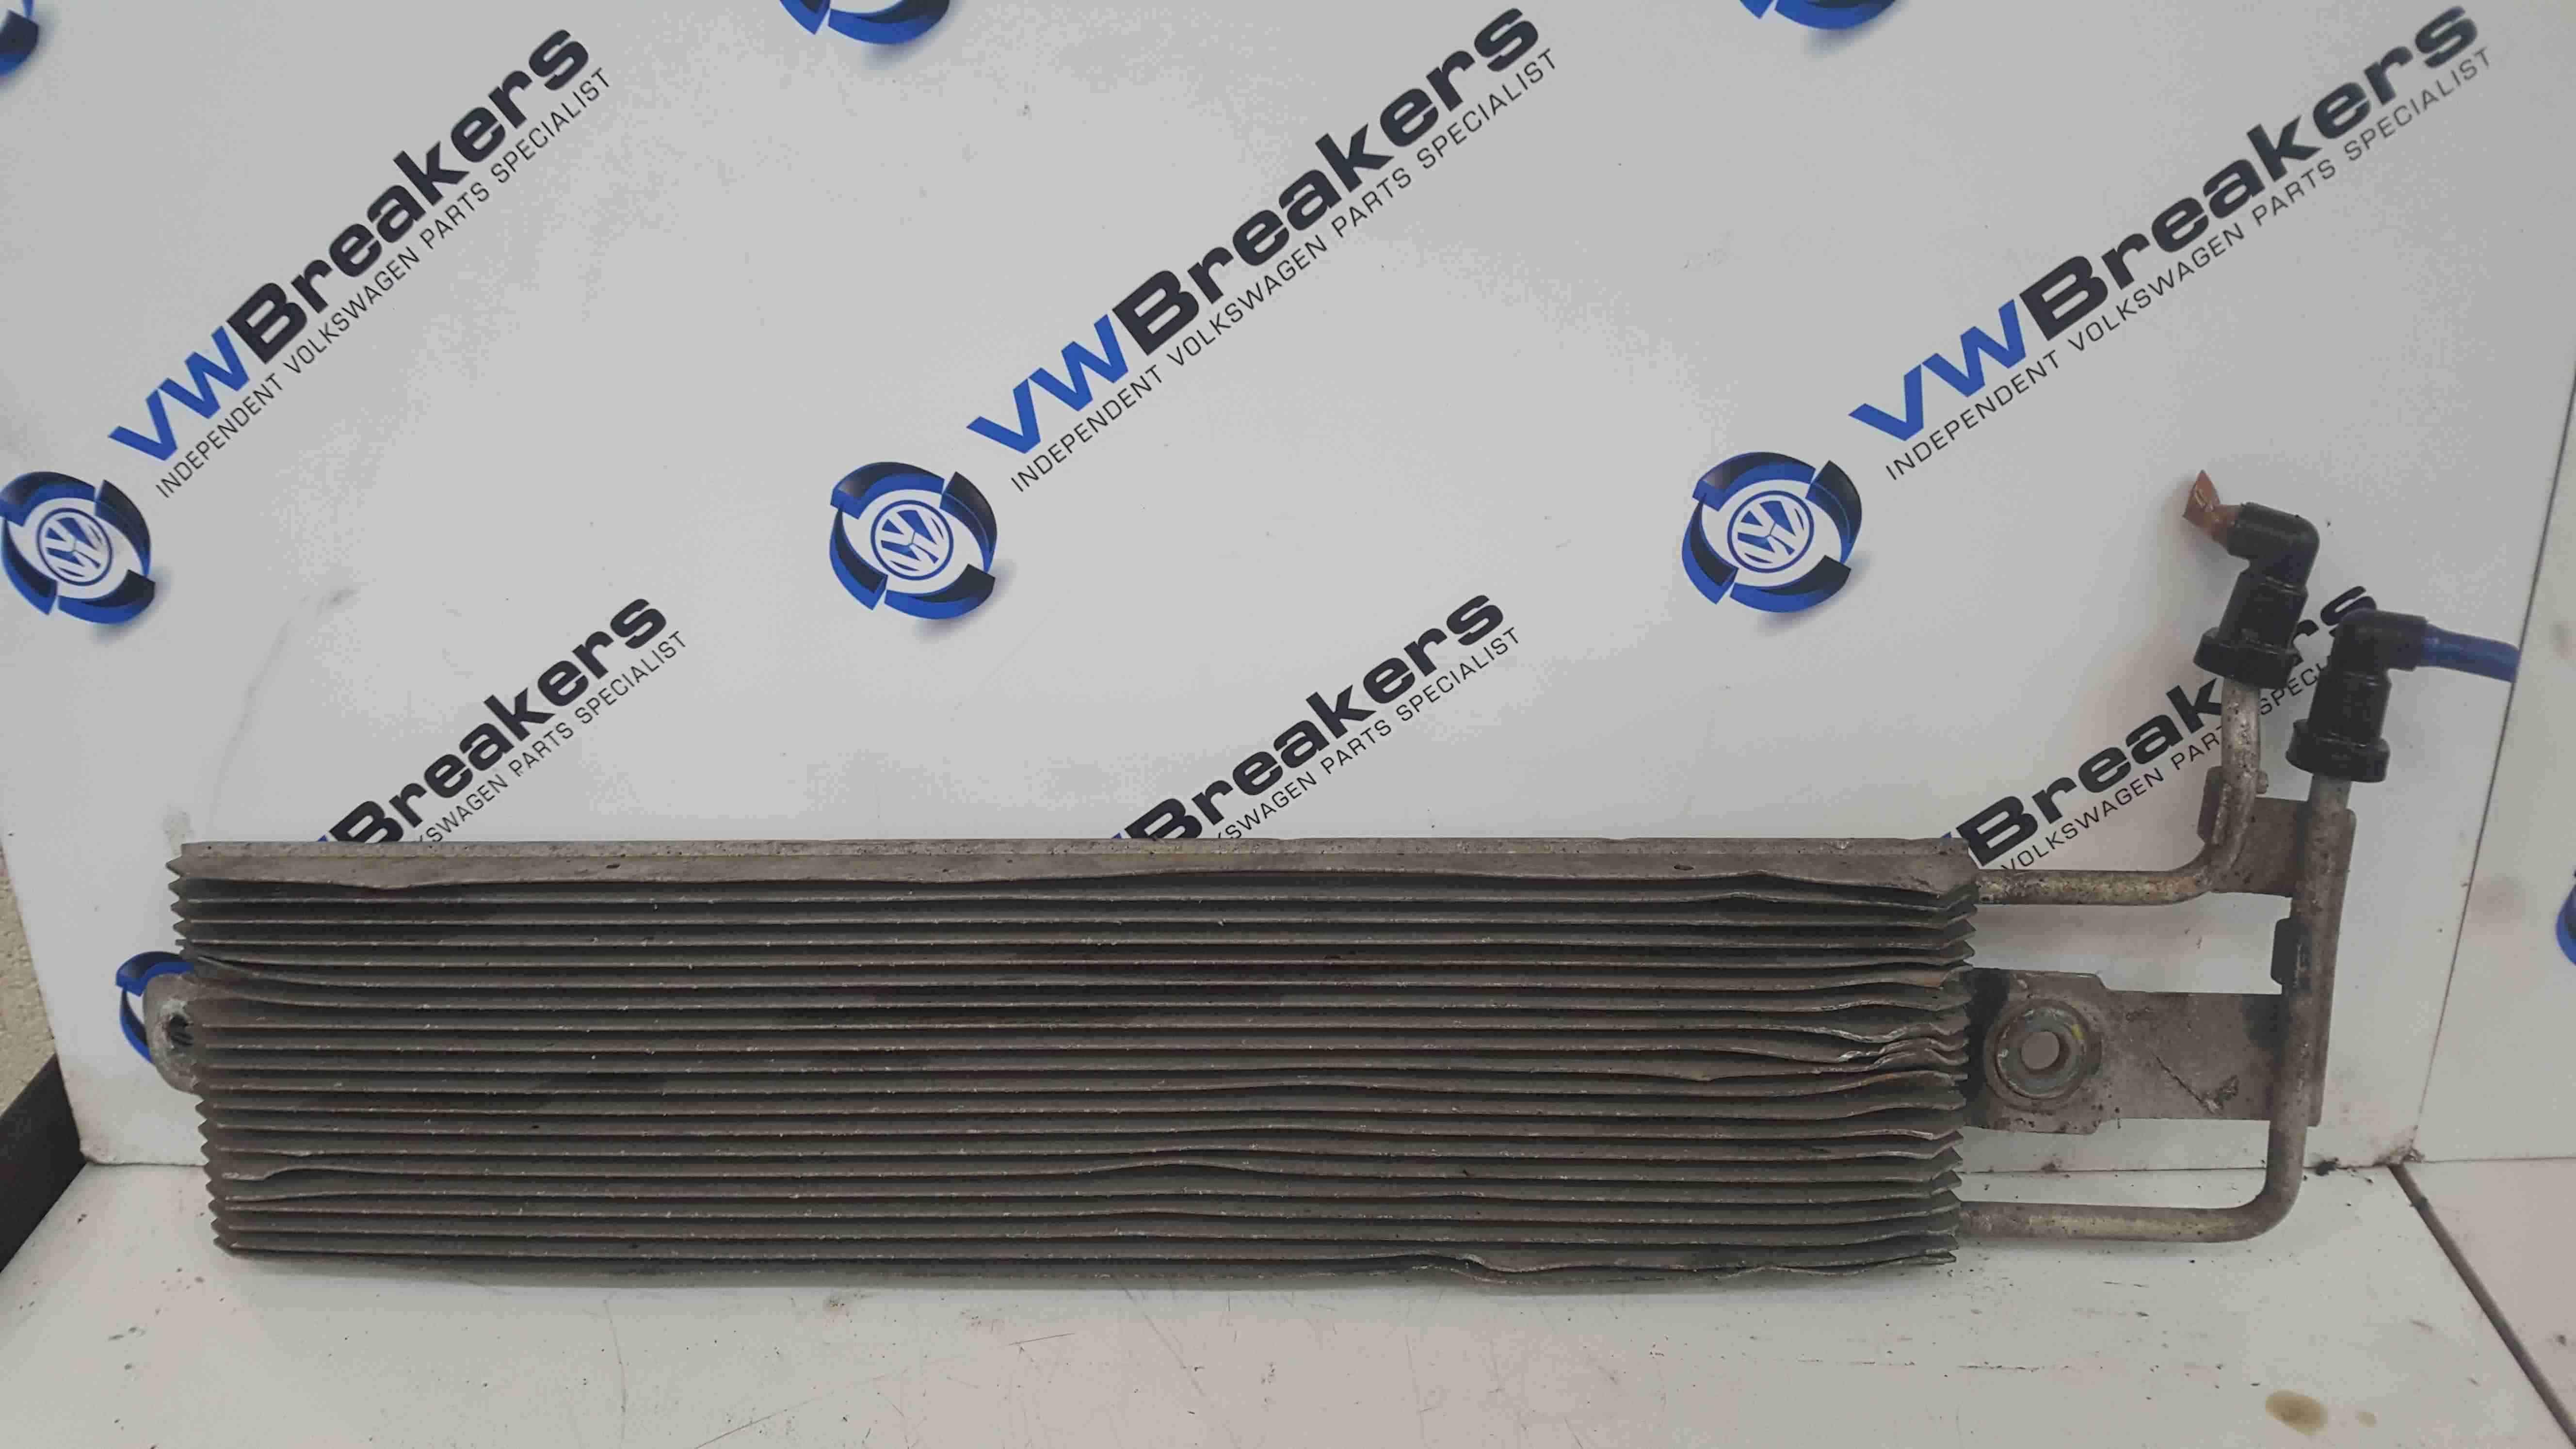 Volkswagen Golf MK5 2003-2009 1.9 TDi Diesel Fuel Cooler Radiator 1k0203491D